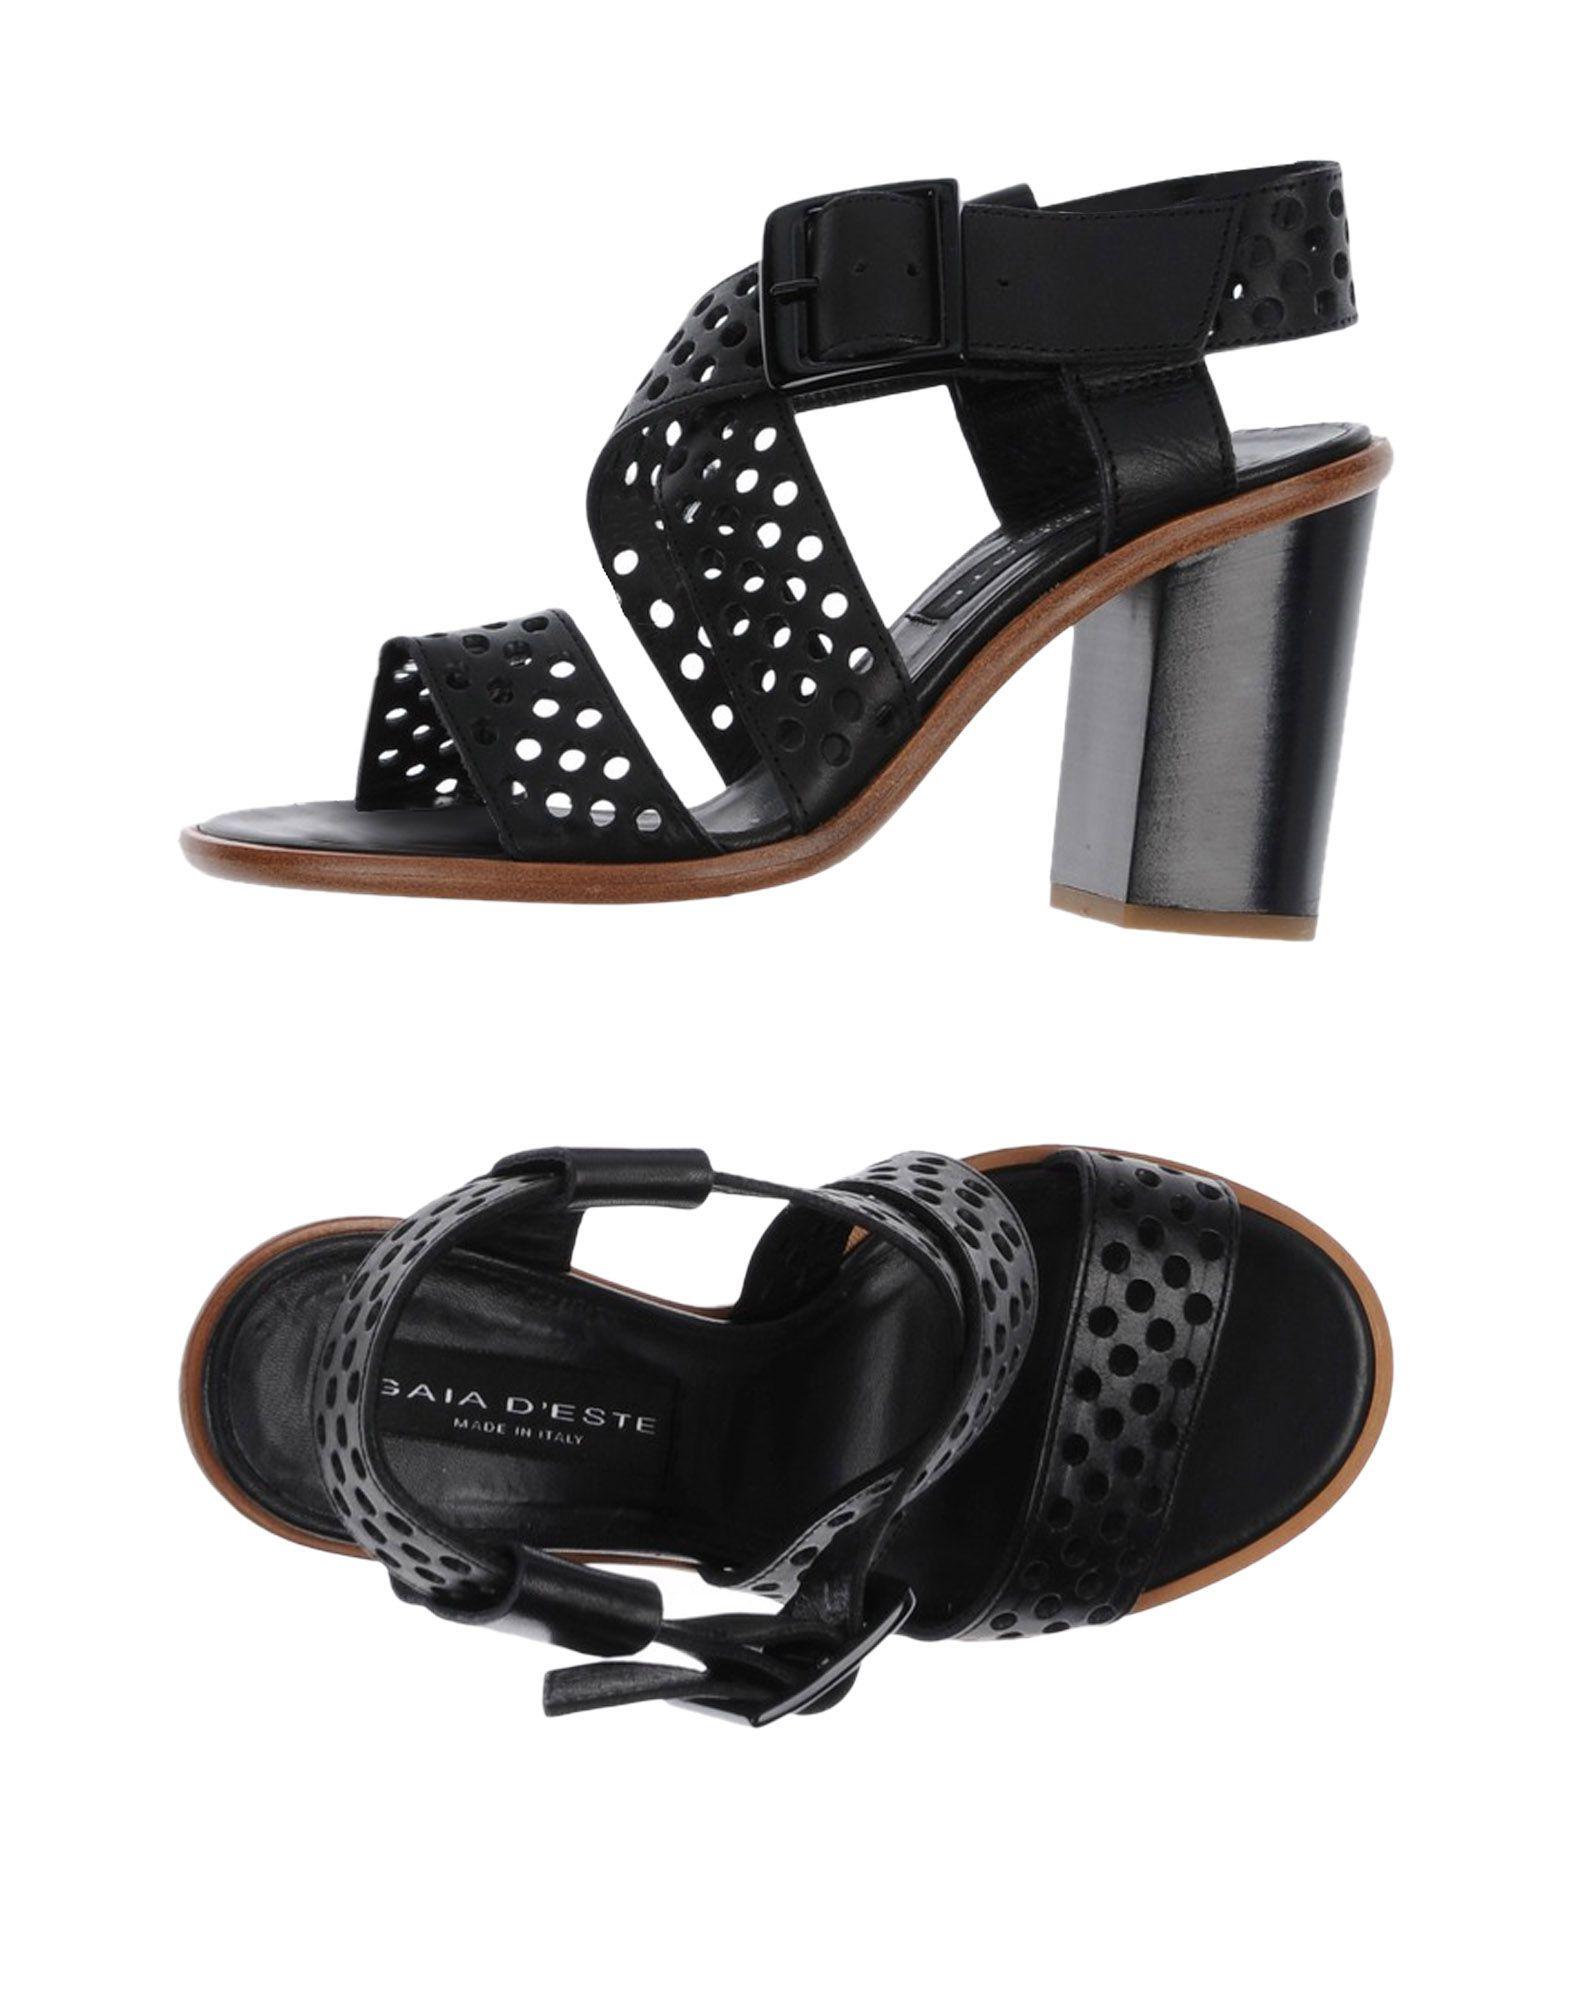 Gaia D'este Sandalen Damen  11429376BF Gute Qualität beliebte Schuhe